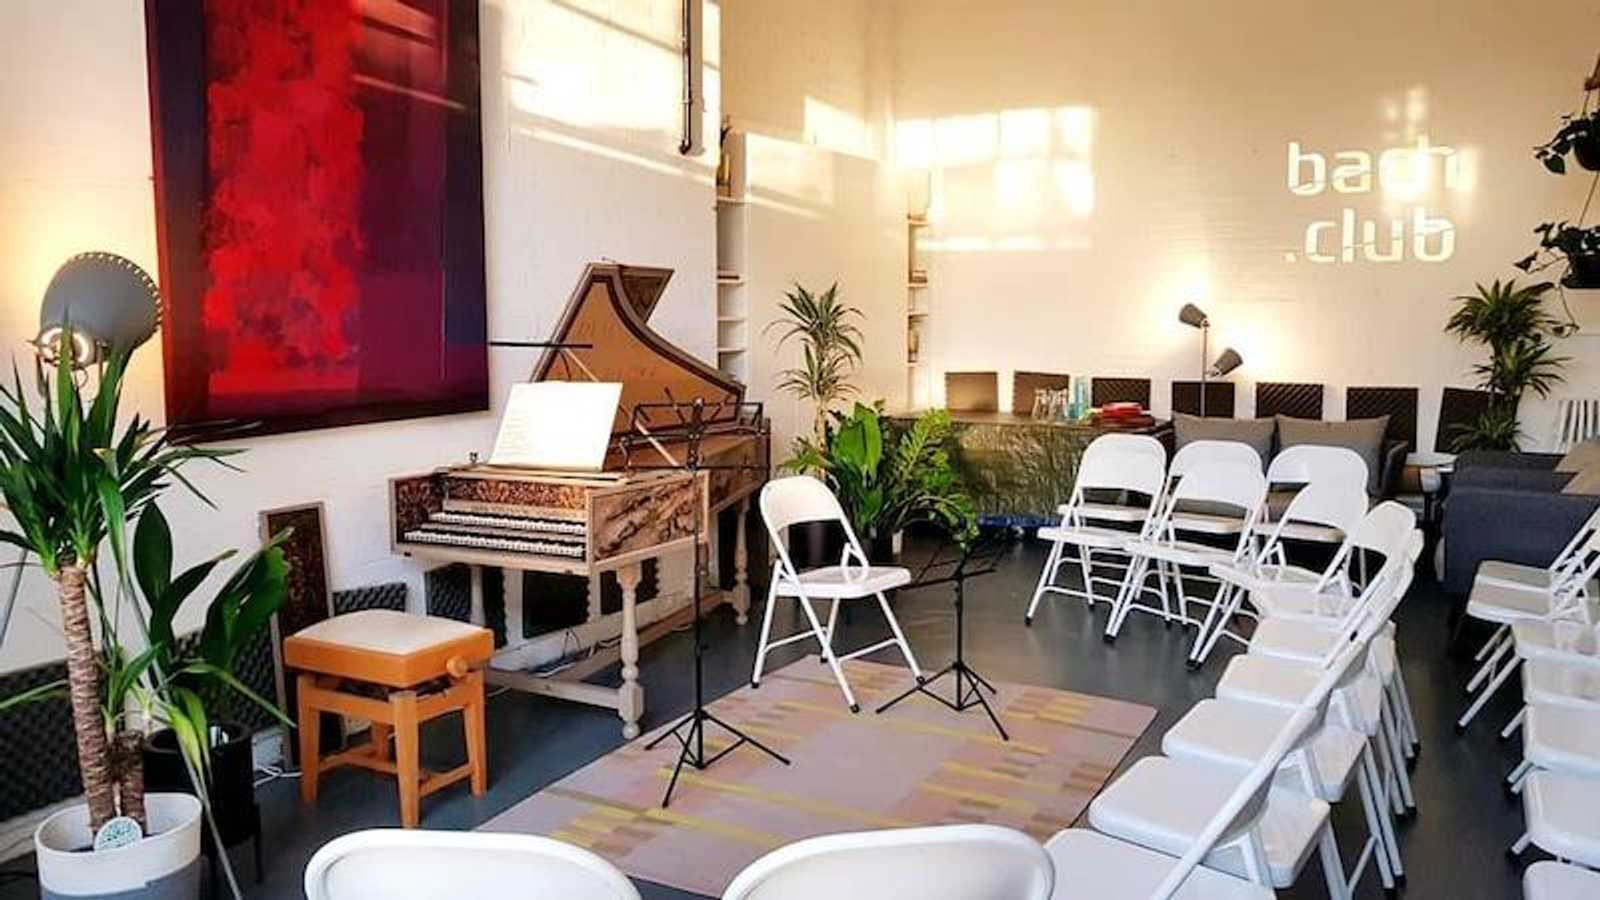 Bach Club | Studio with harpsichord & fortepiano